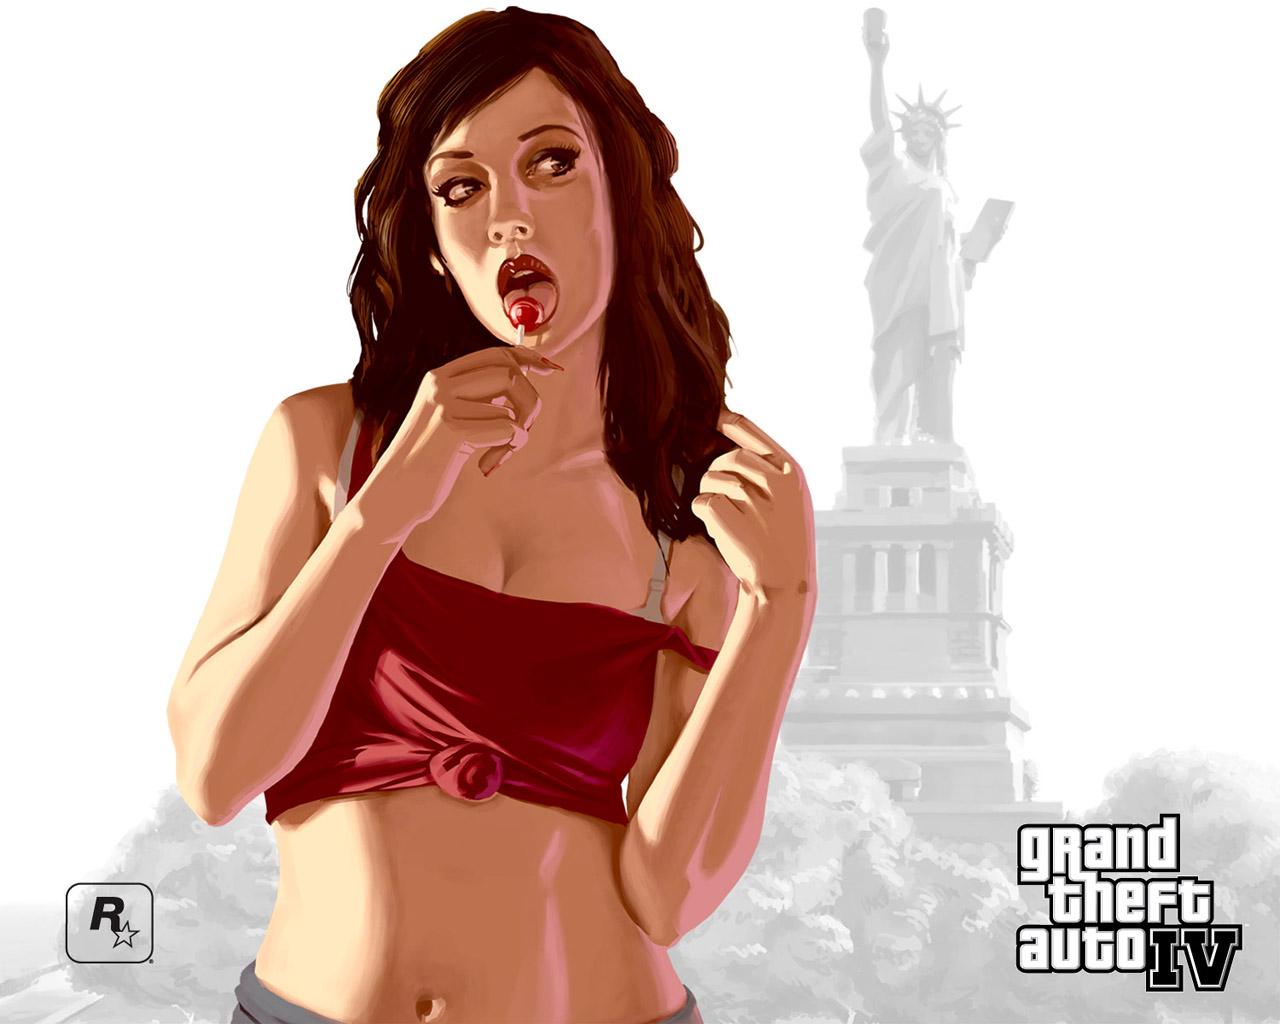 http://4.bp.blogspot.com/-z9aCYcv7Atc/Ts147M6PWII/AAAAAAAADHY/1WLRgJ69mi0/s1600/GTA_4_outdoor-lollipop_1280x1024.jpg